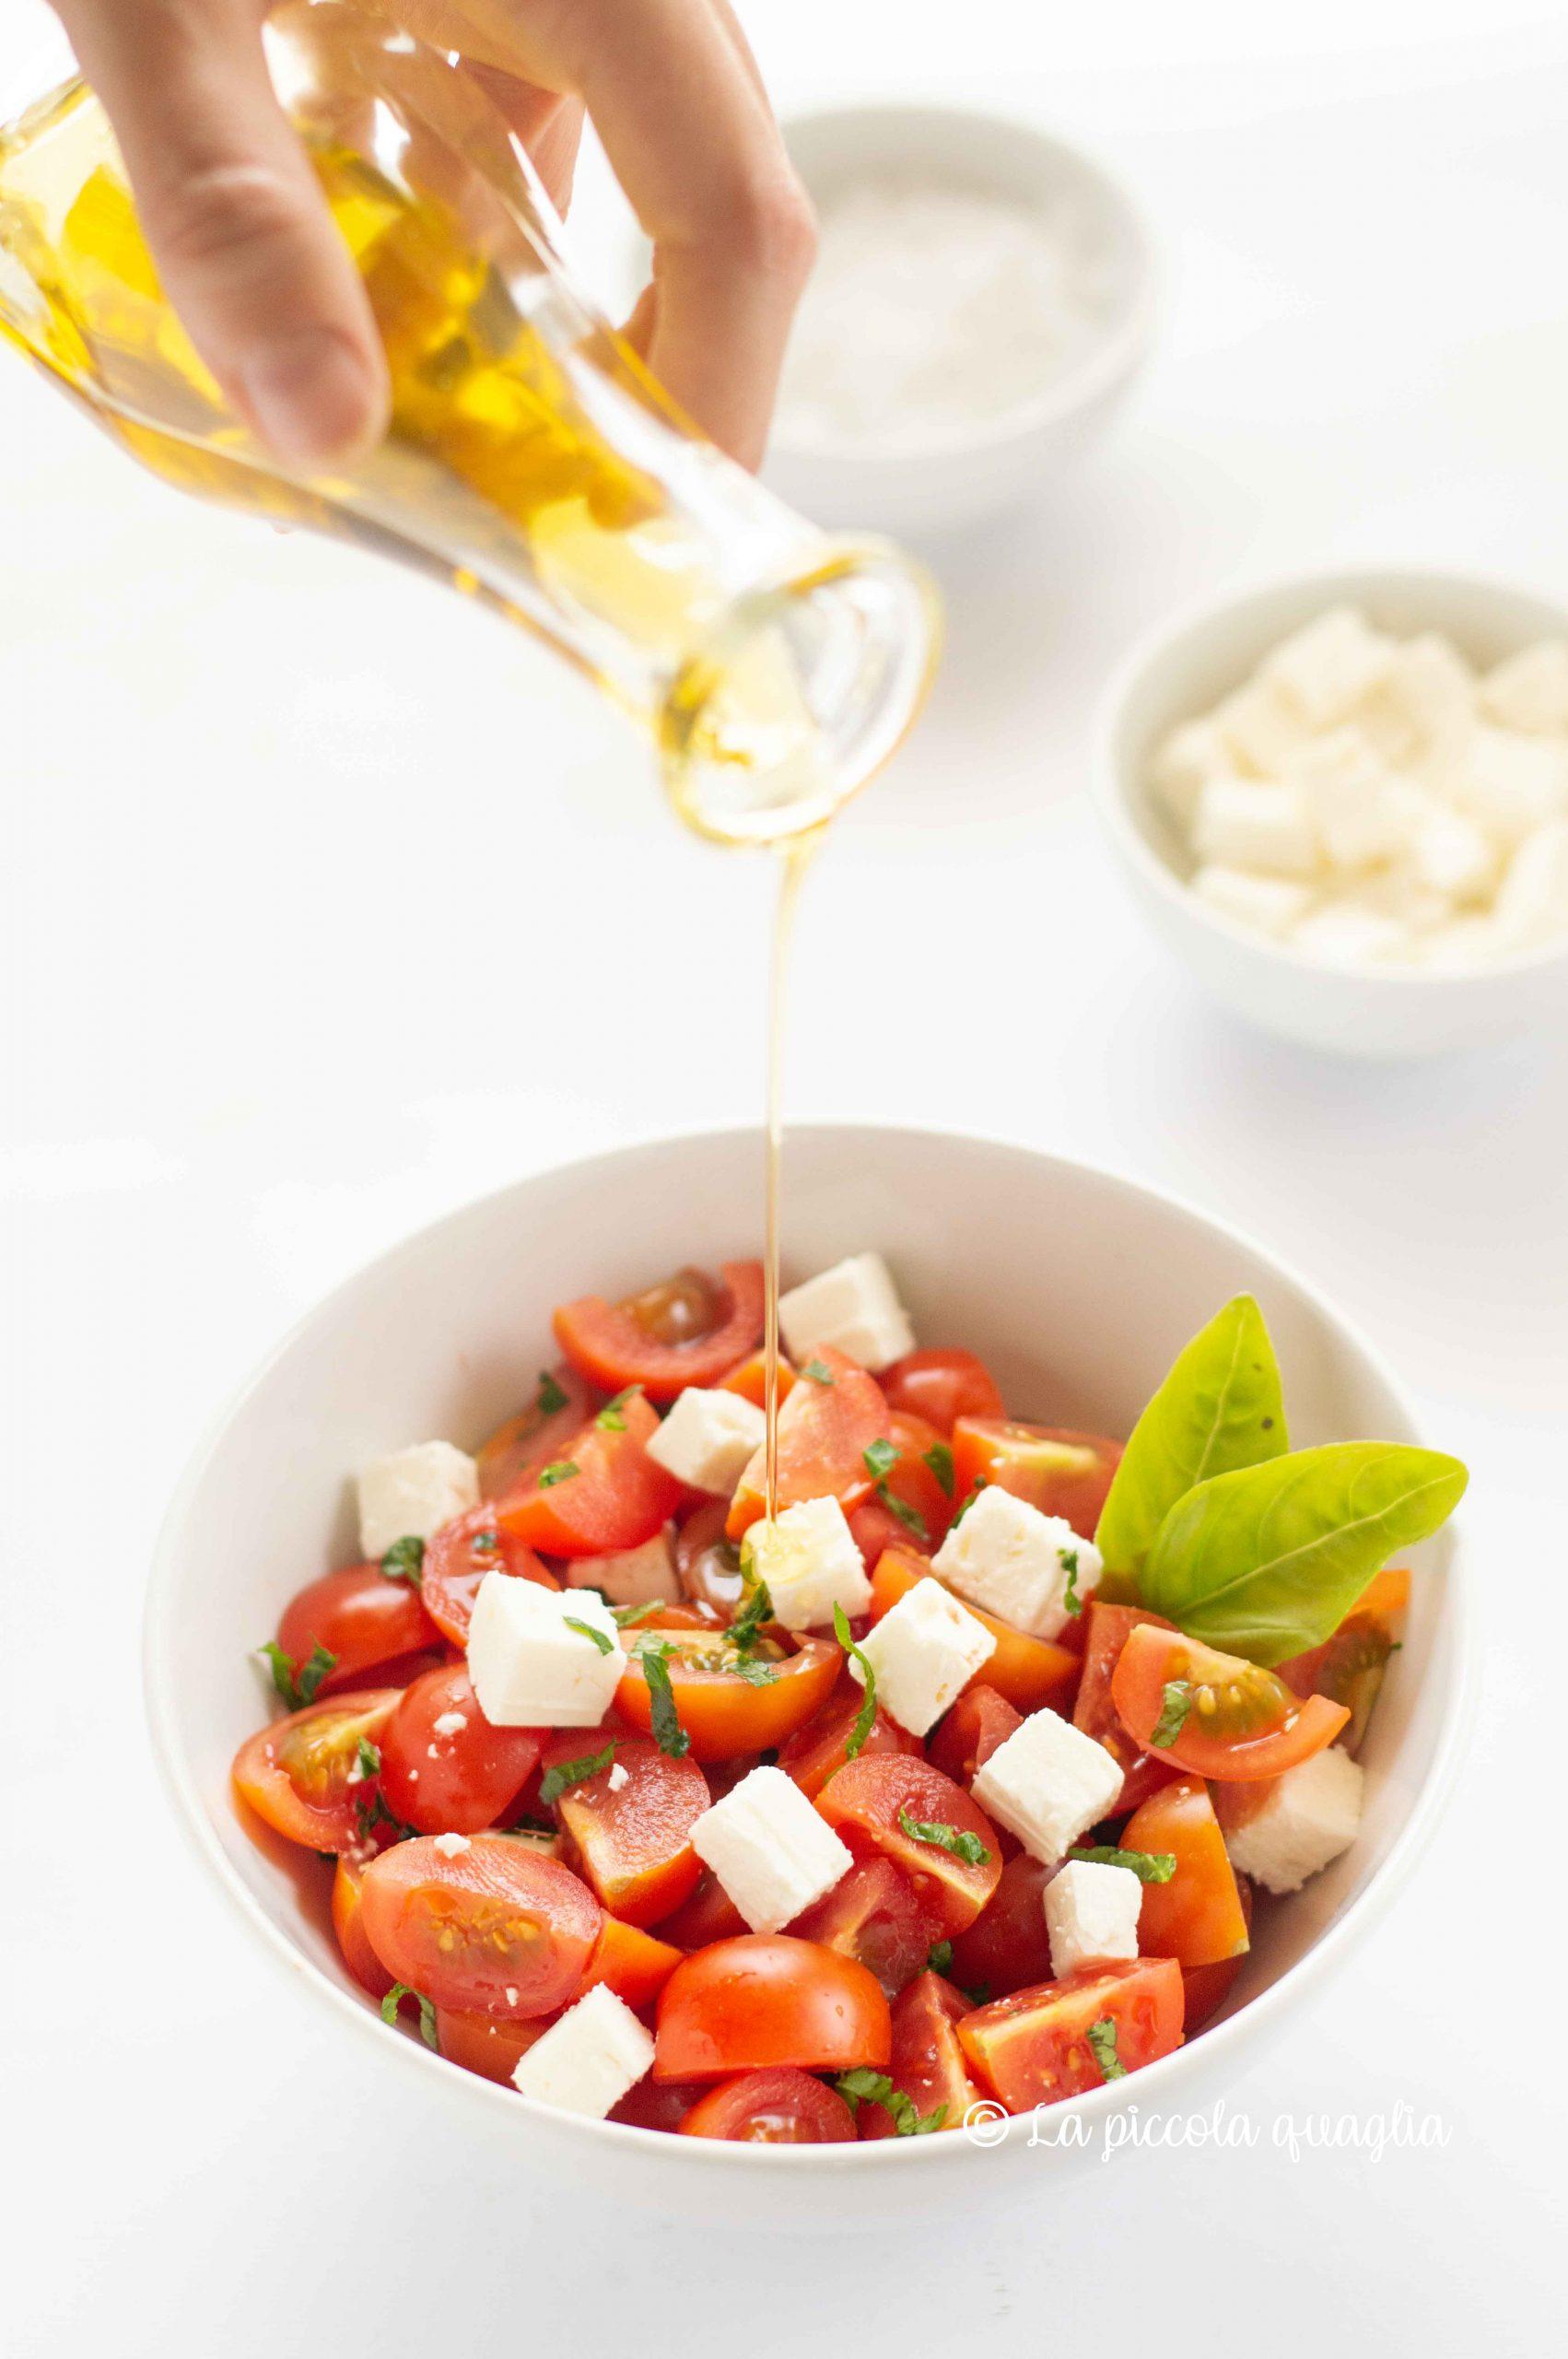 Horiatiki – insalata alla greca